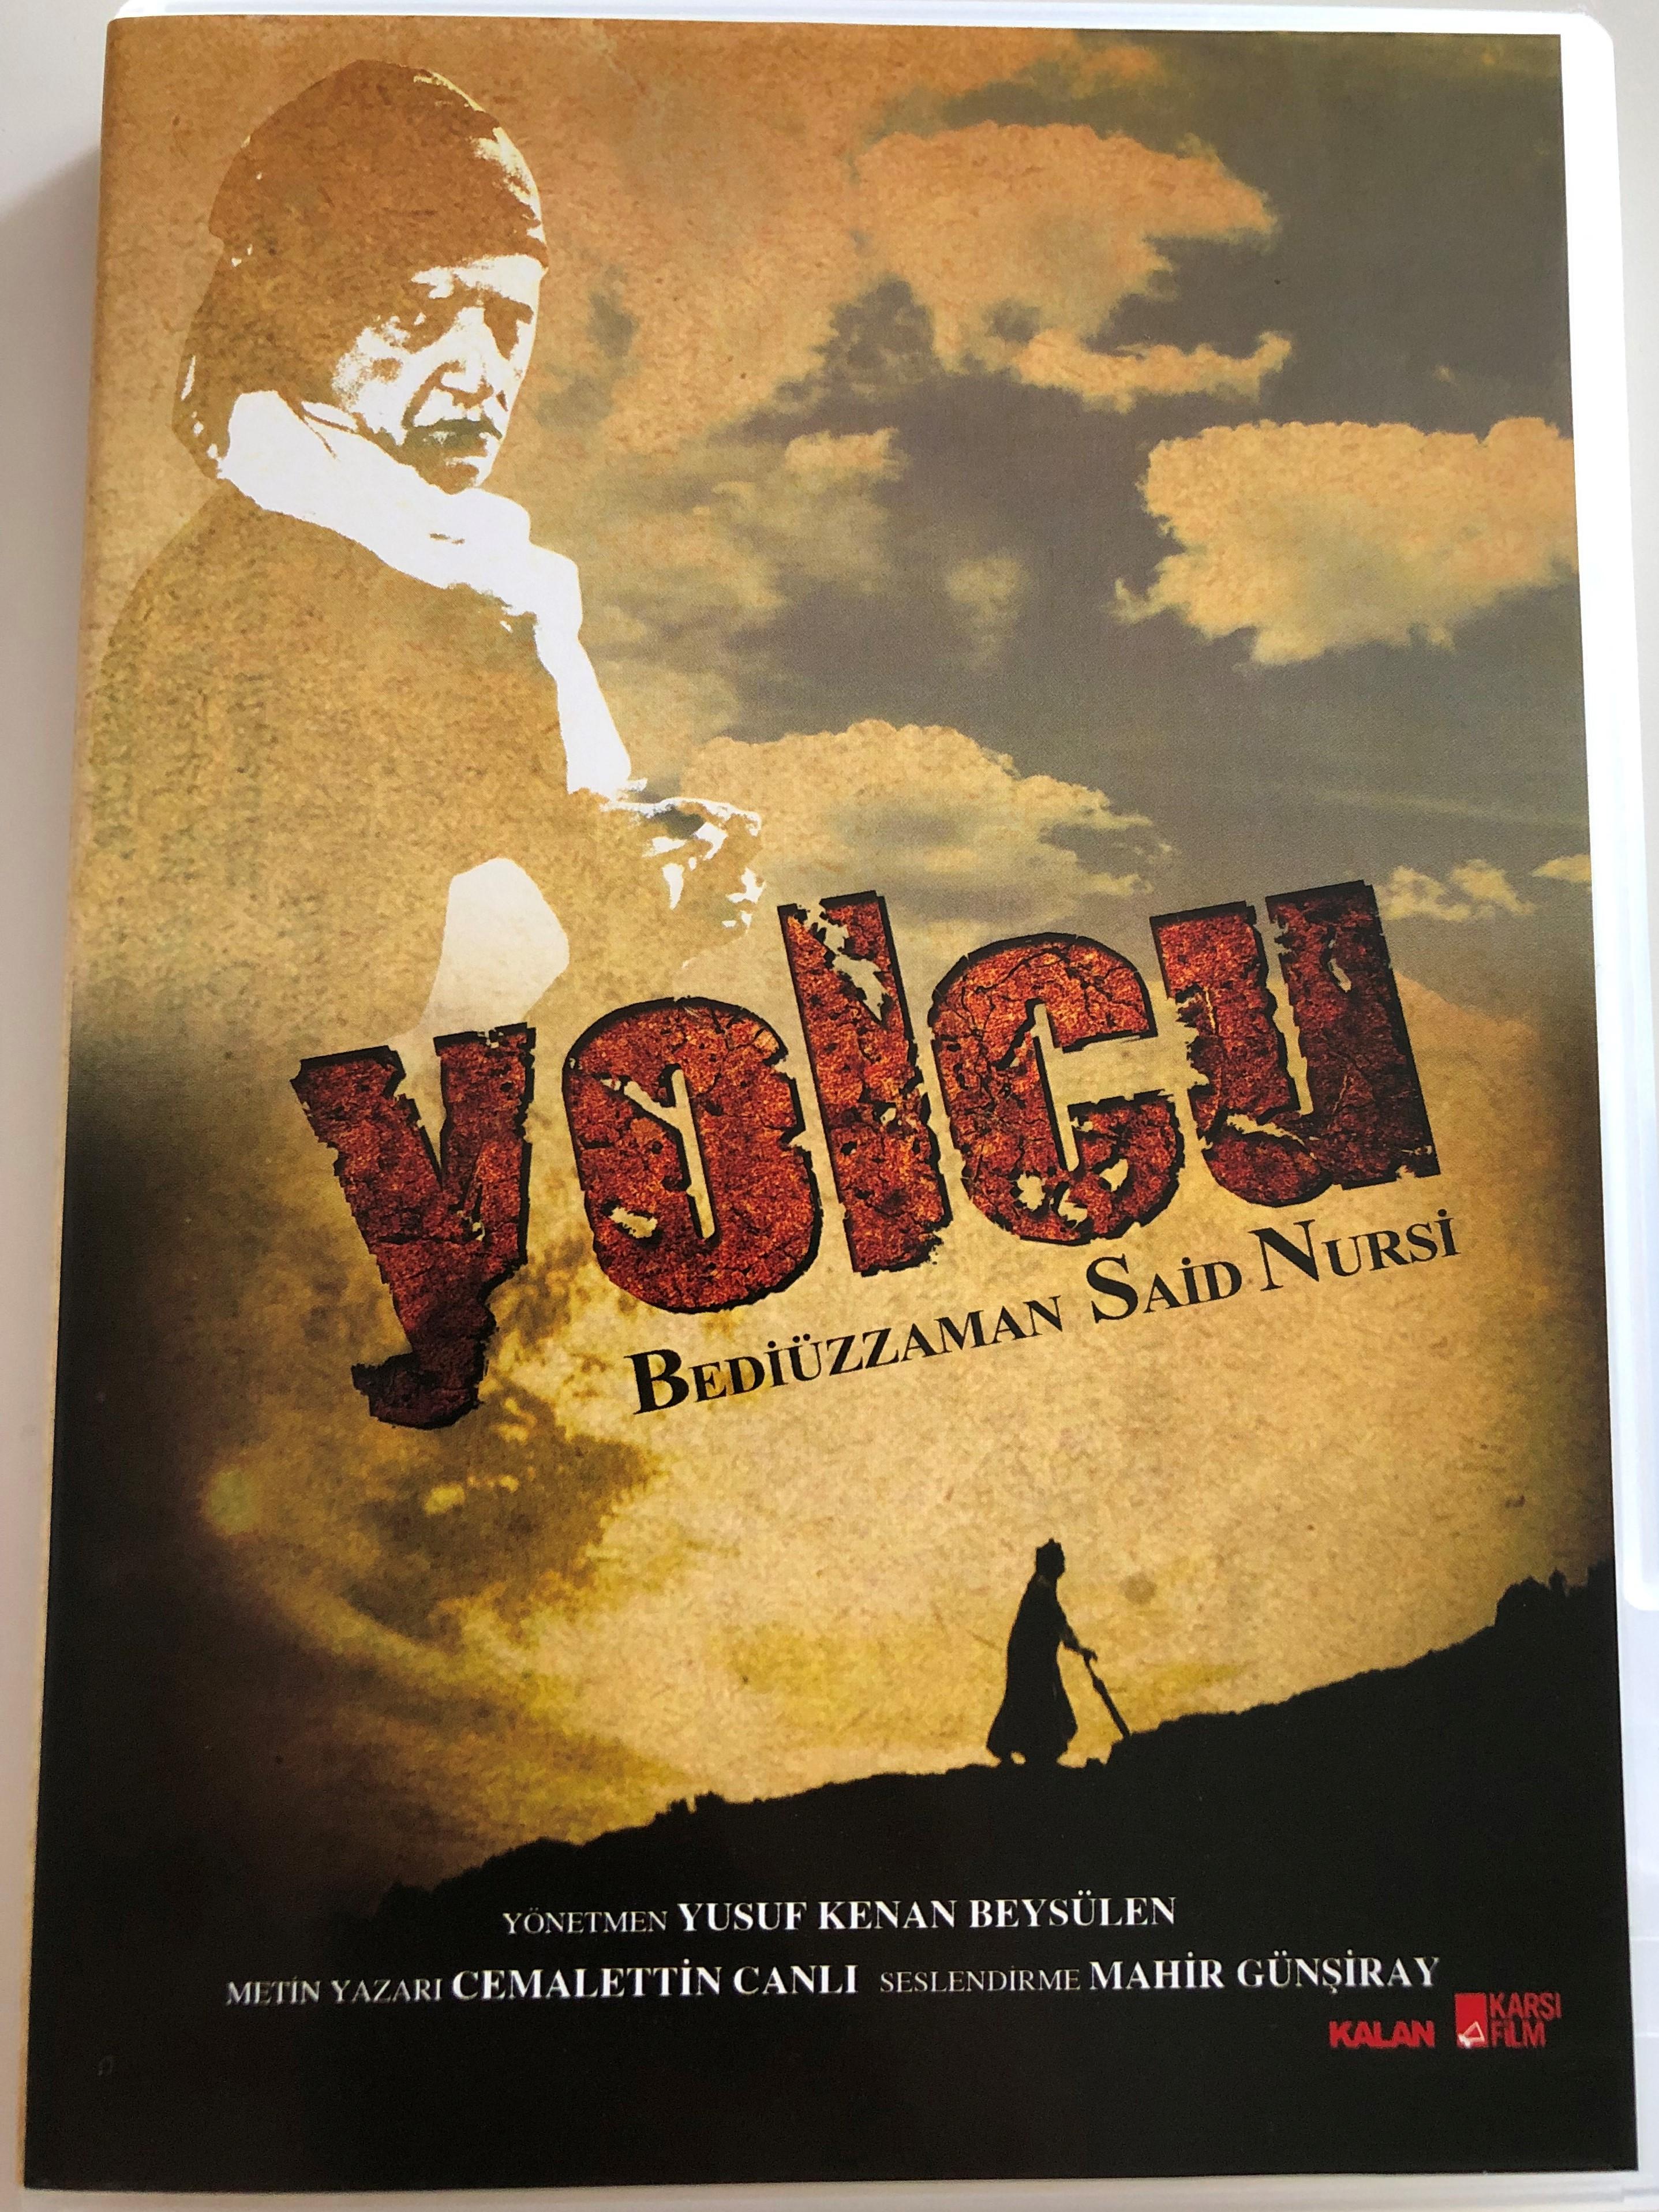 -yolcu-bedi-zzaman-said-nursi-dvd-1994-passenger-directed-by-yusuf-kenan-beys-len-1-.jpg